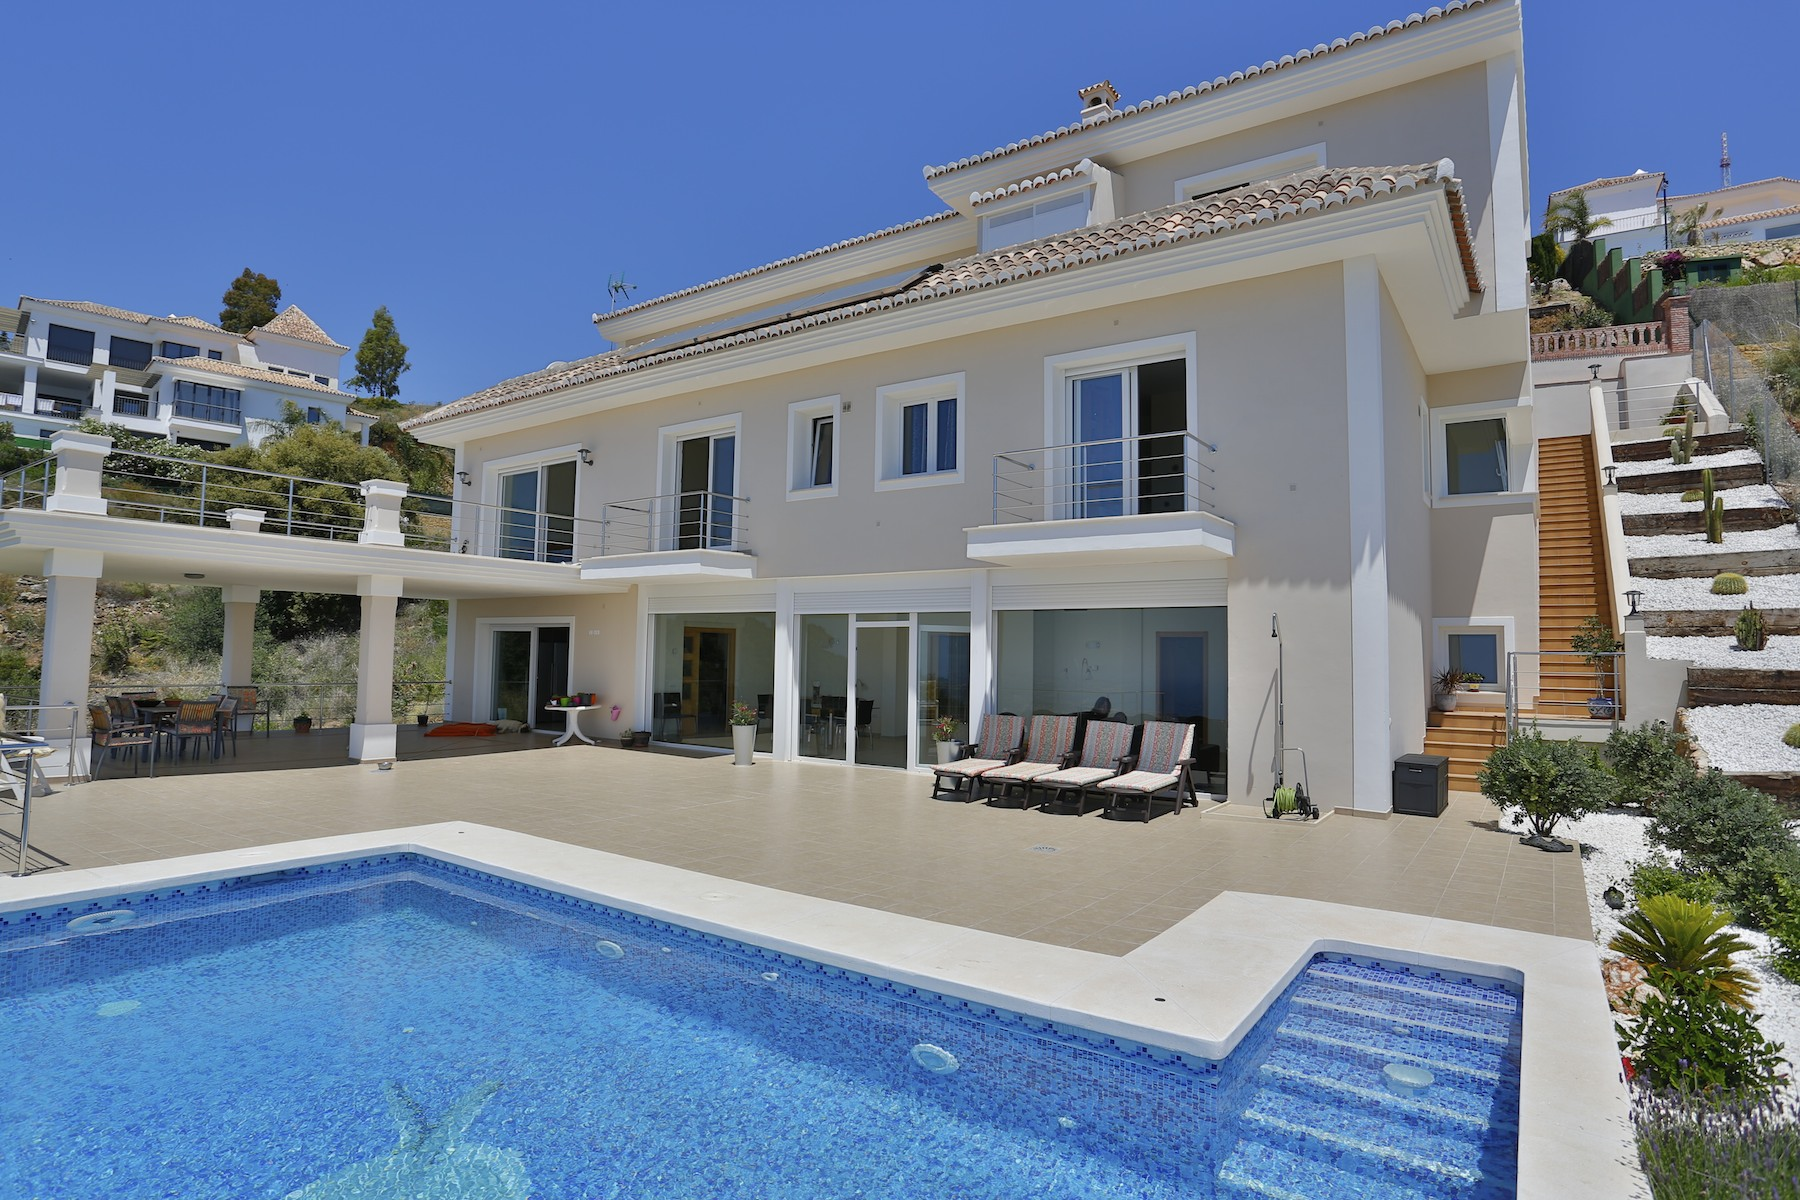 Maison unifamiliale pour l Vente à Modern Style villa Altos de Los Monteros Marbella, Costa Del Sol, 29600 Espagne